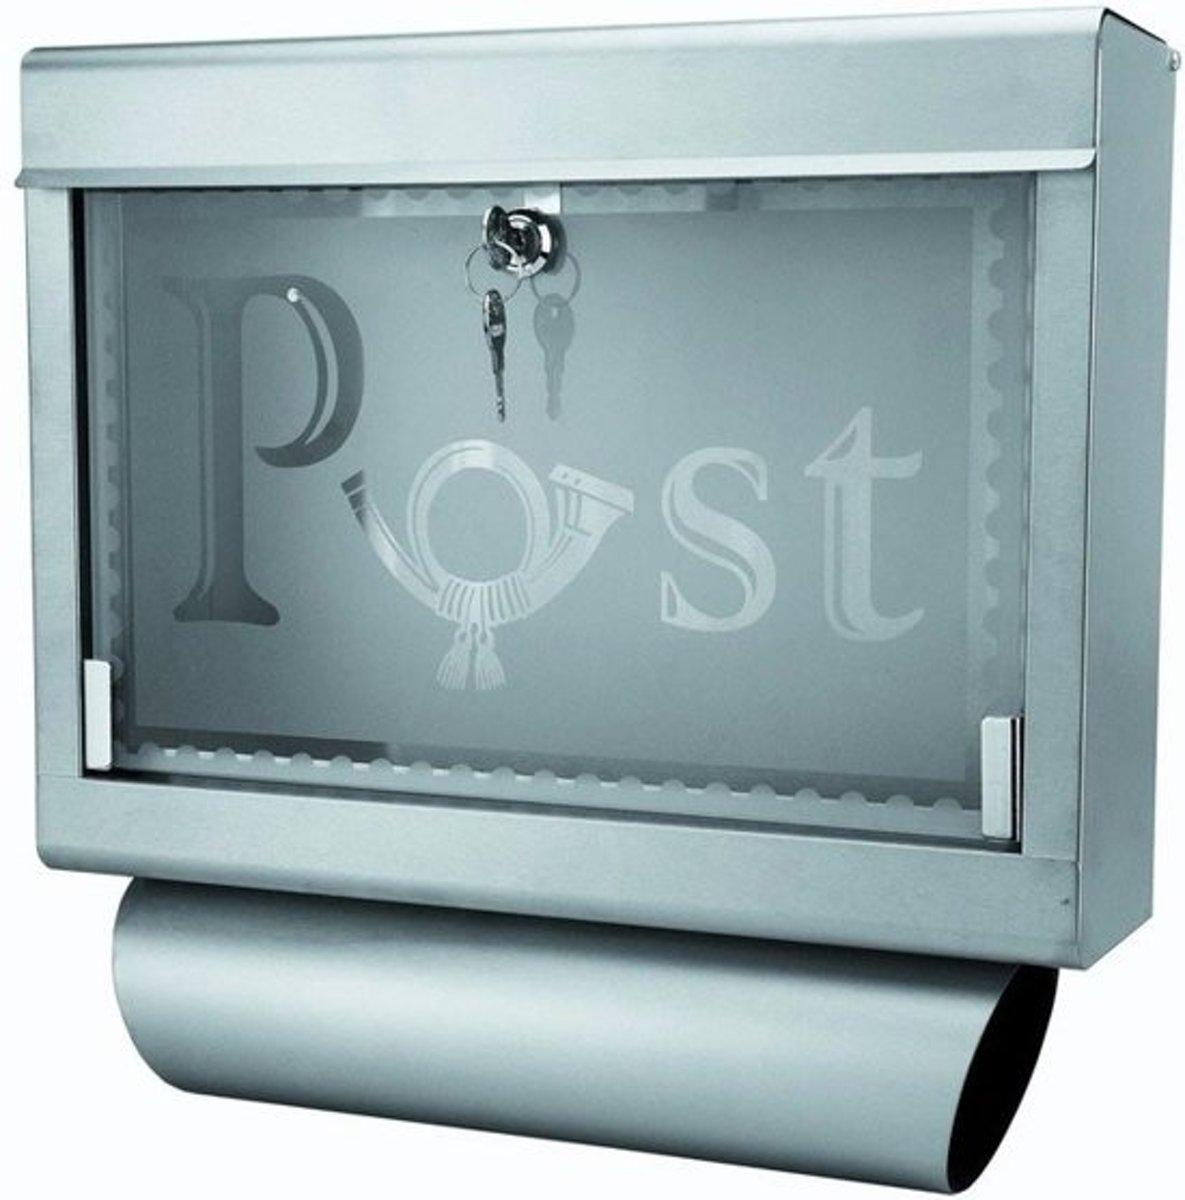 Grafner brievenbus met krantenrol, RVS en glas